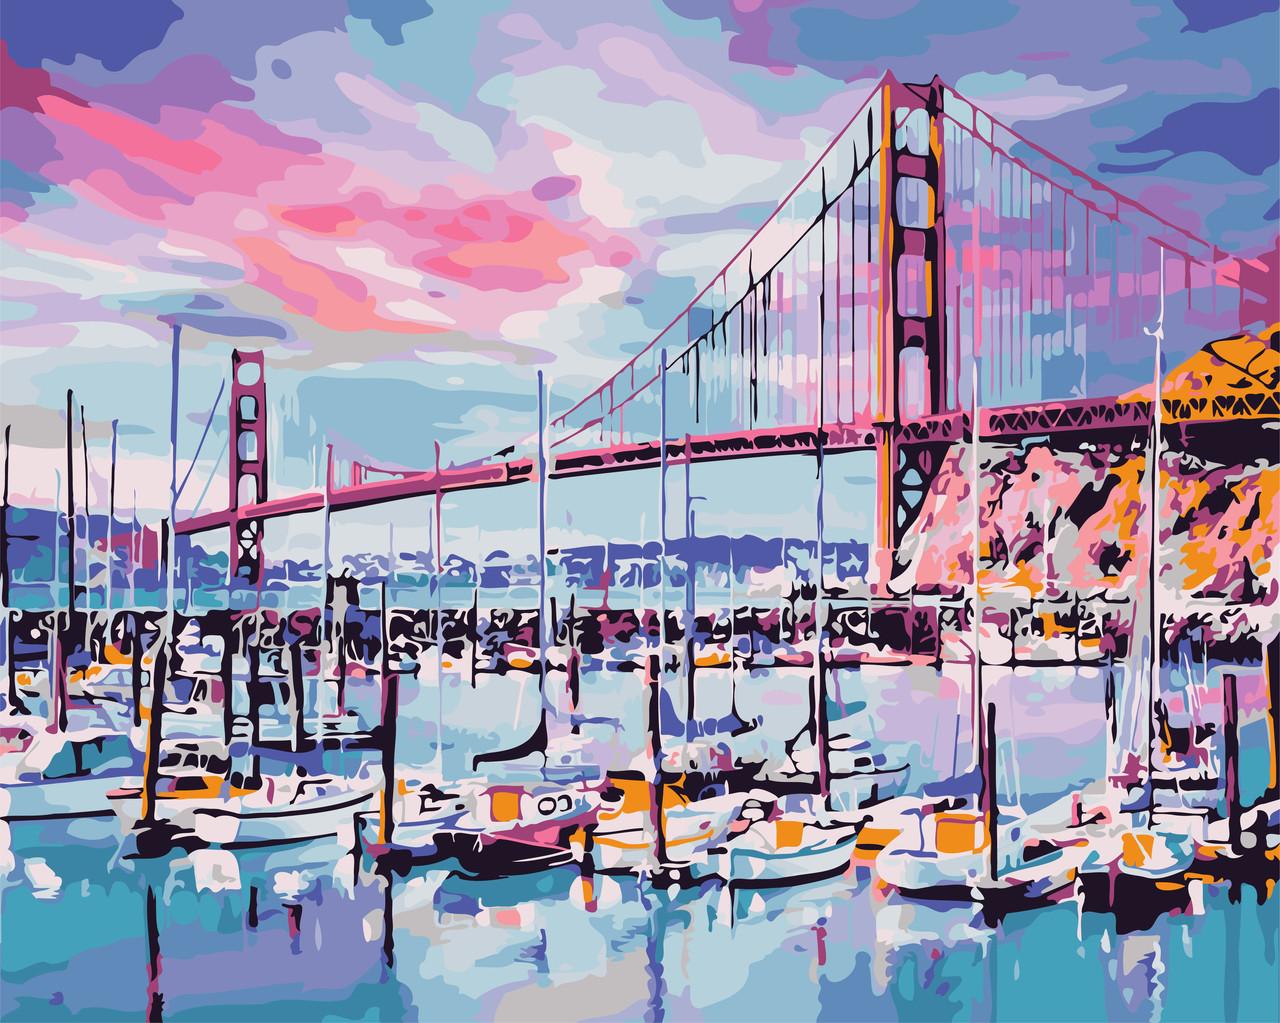 Картина по номерам - Мост Золотые ворота ArtStory 40*50 см. (AS0690)